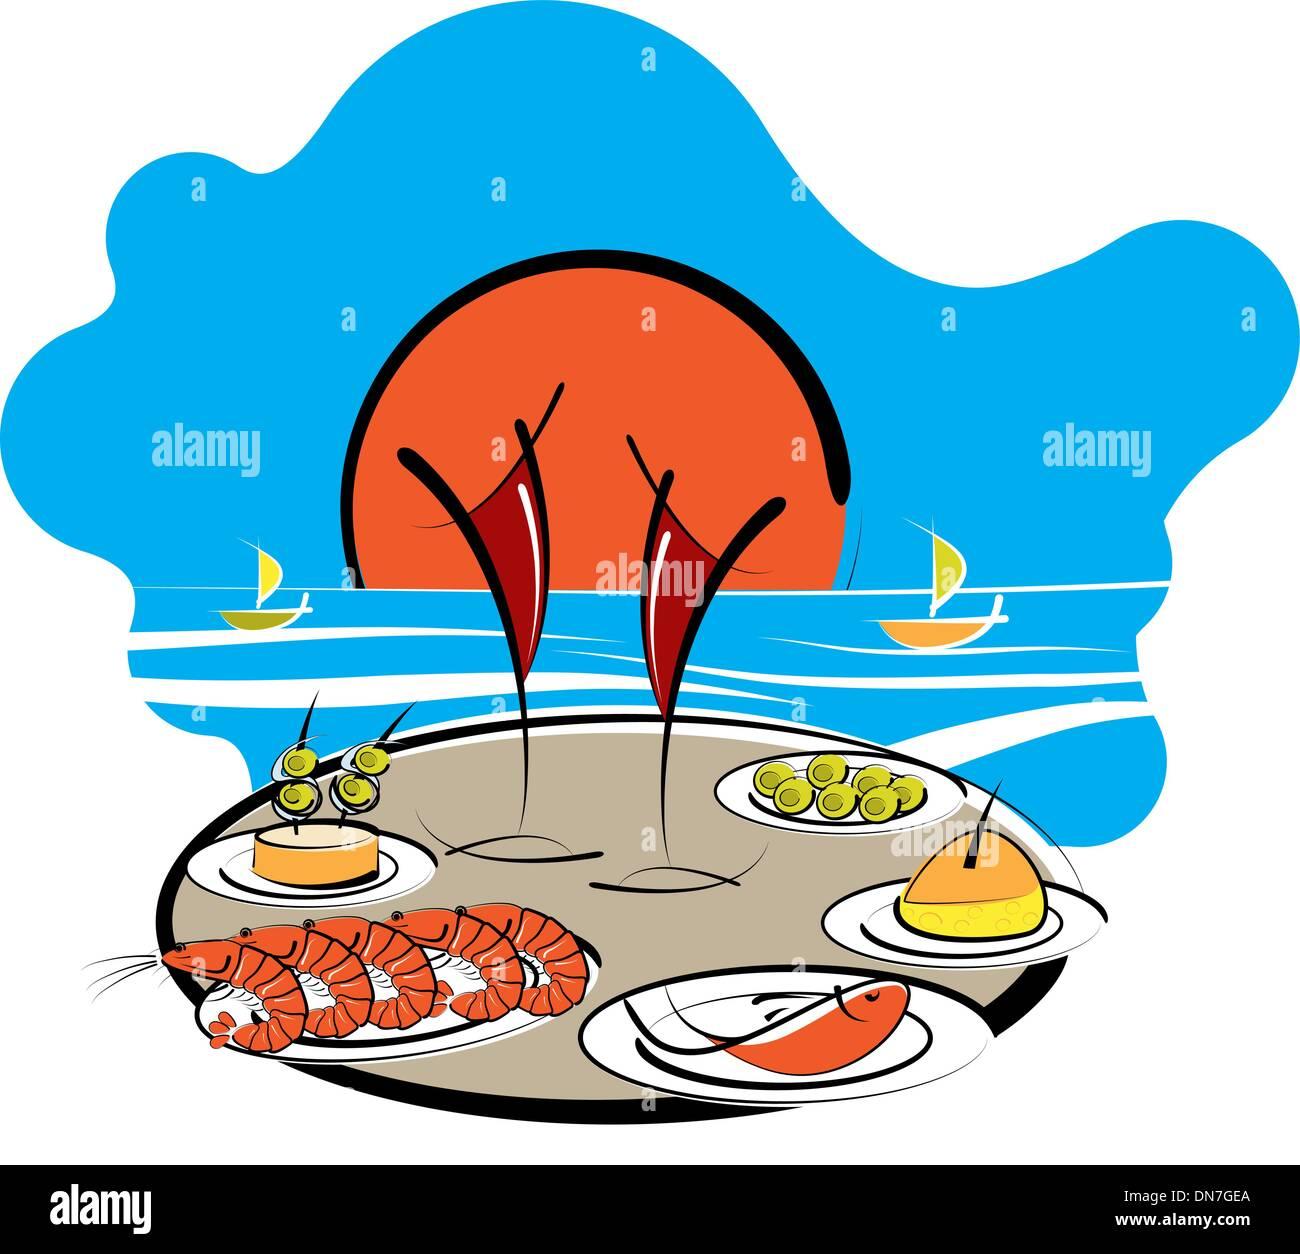 Spanish food at the seaside Spanish food - Stock Vector